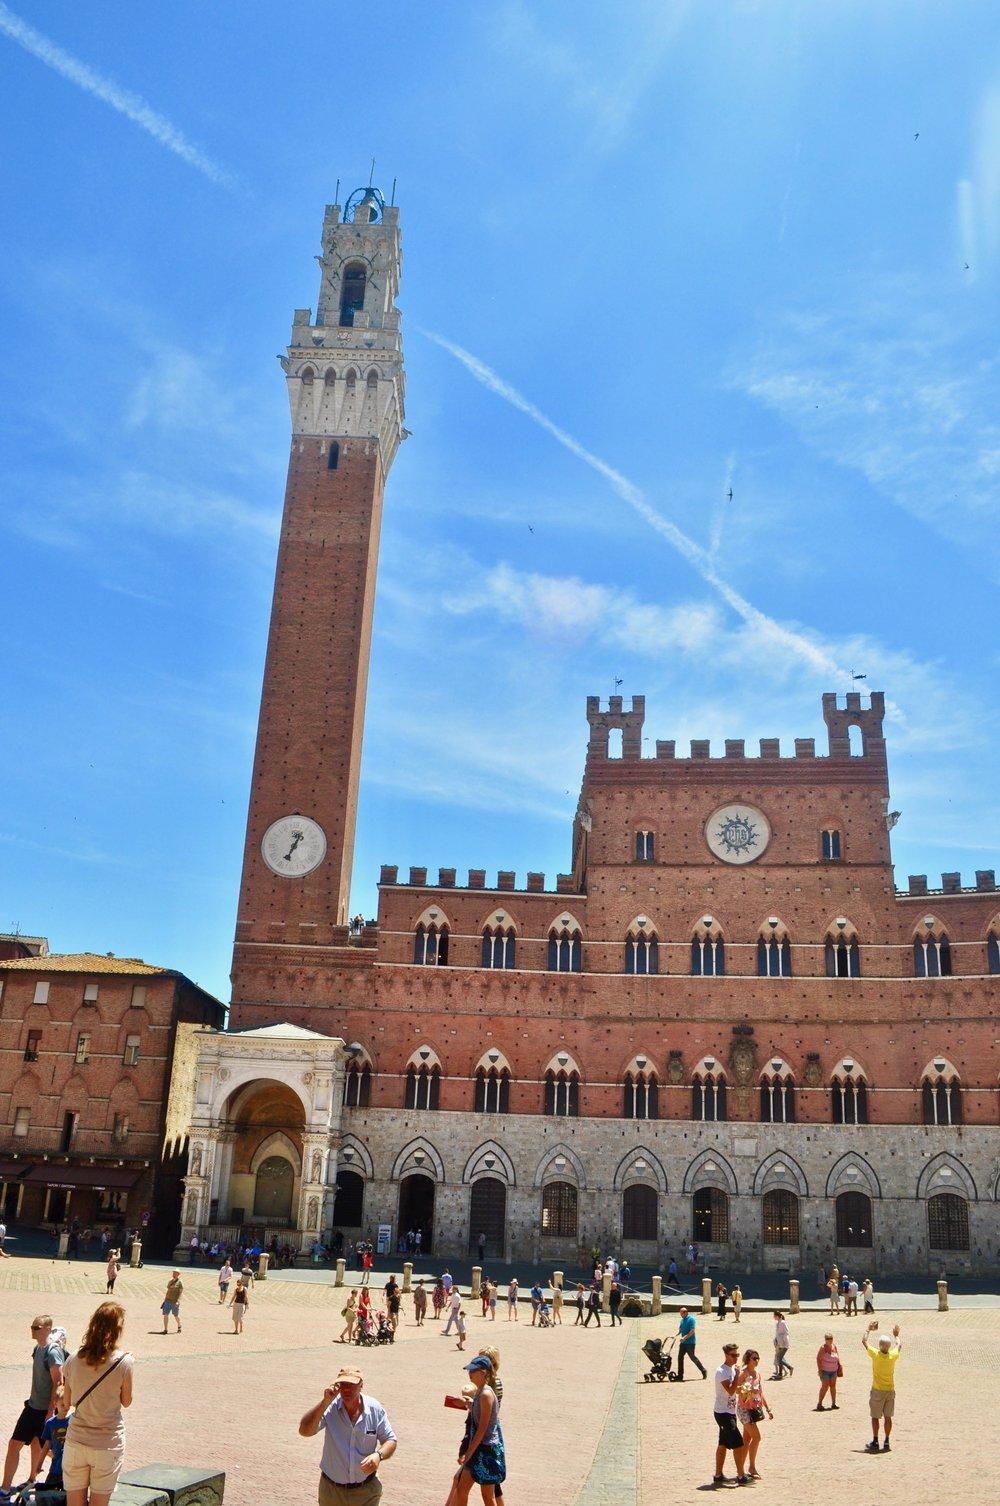 Piazza del Campo and Torre del Mangia - Siena, Italy - A Happy Passport #siena #italy #torredelmangia #piazzadelcampo